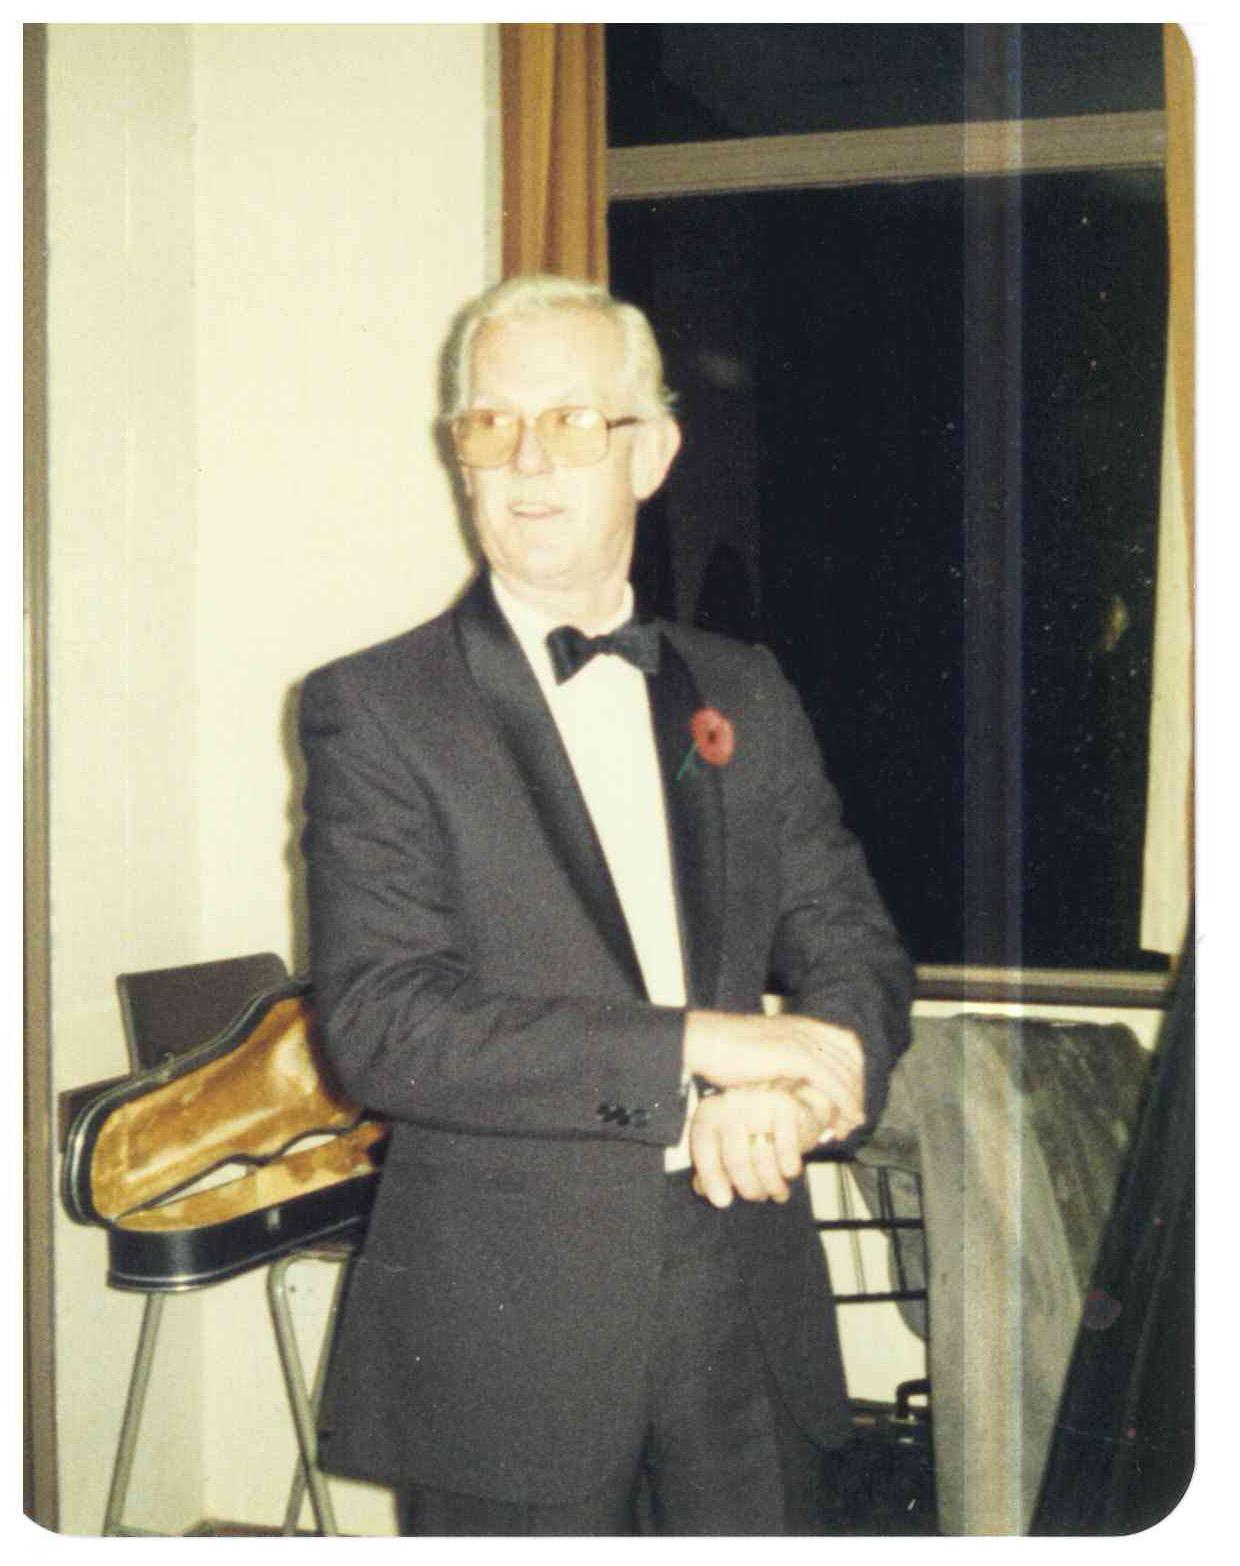 00133-9th November 1985 (5).jpg